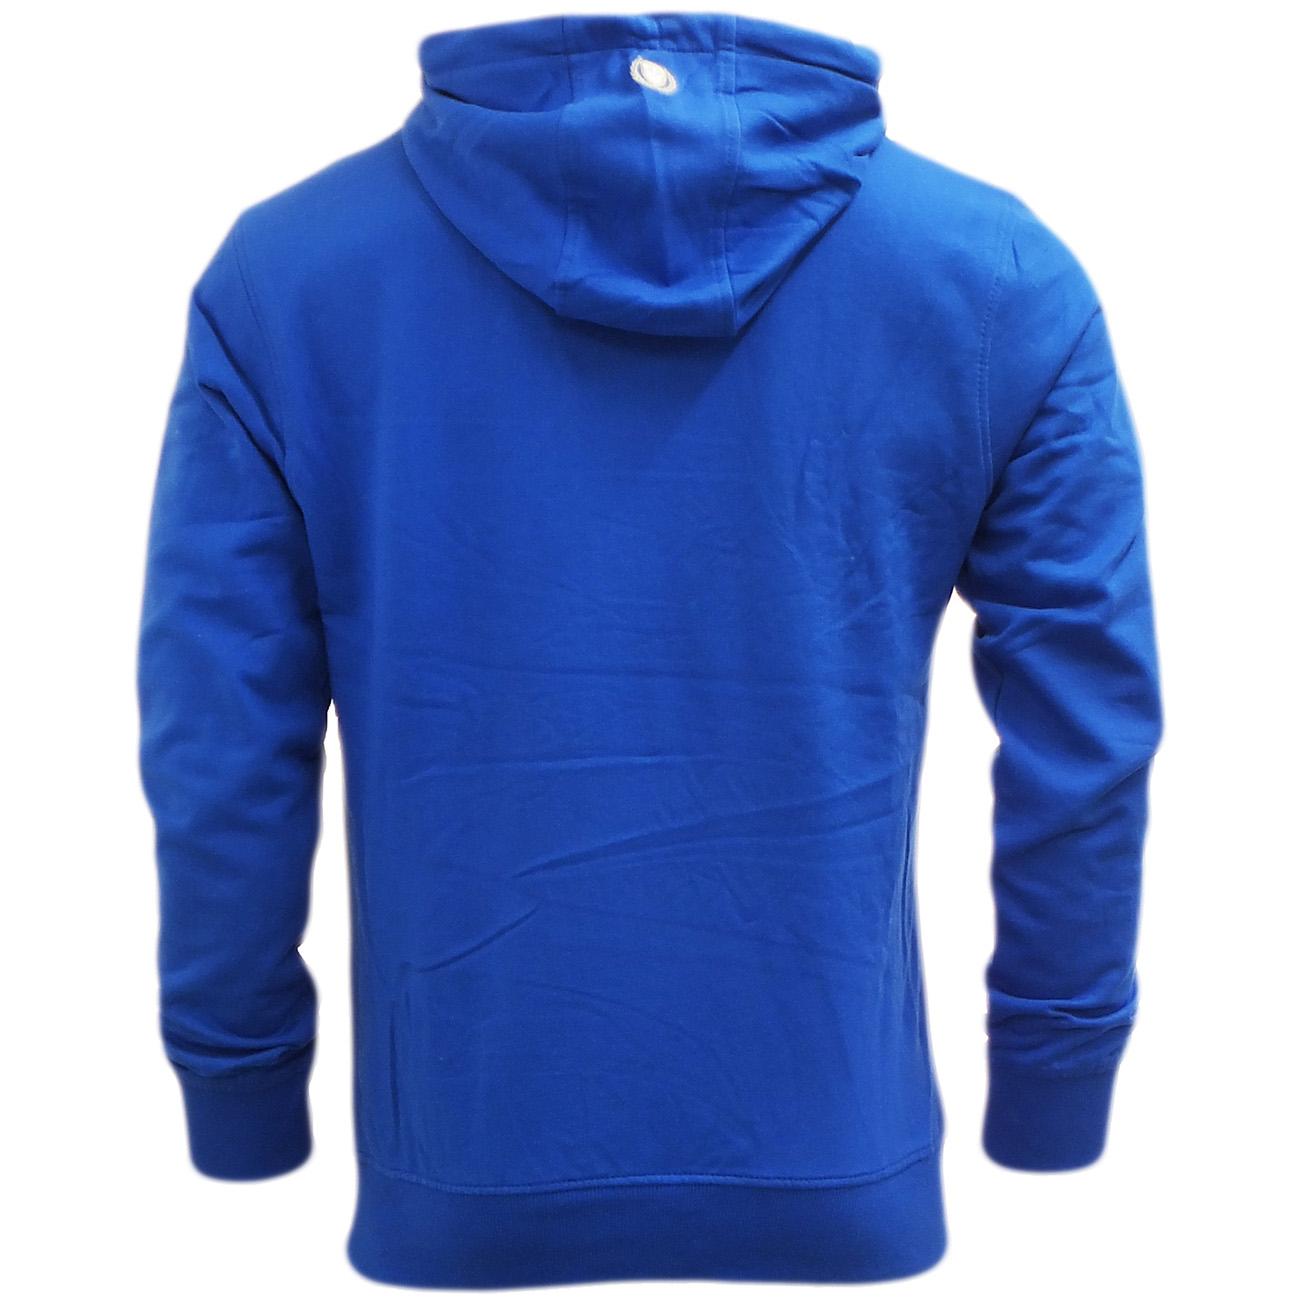 72a42dd3848 Sentinel Mens Royal Blue Hoodie Large - Twisted Faith Hooded Jumper  Sweatshirt - Rafaello